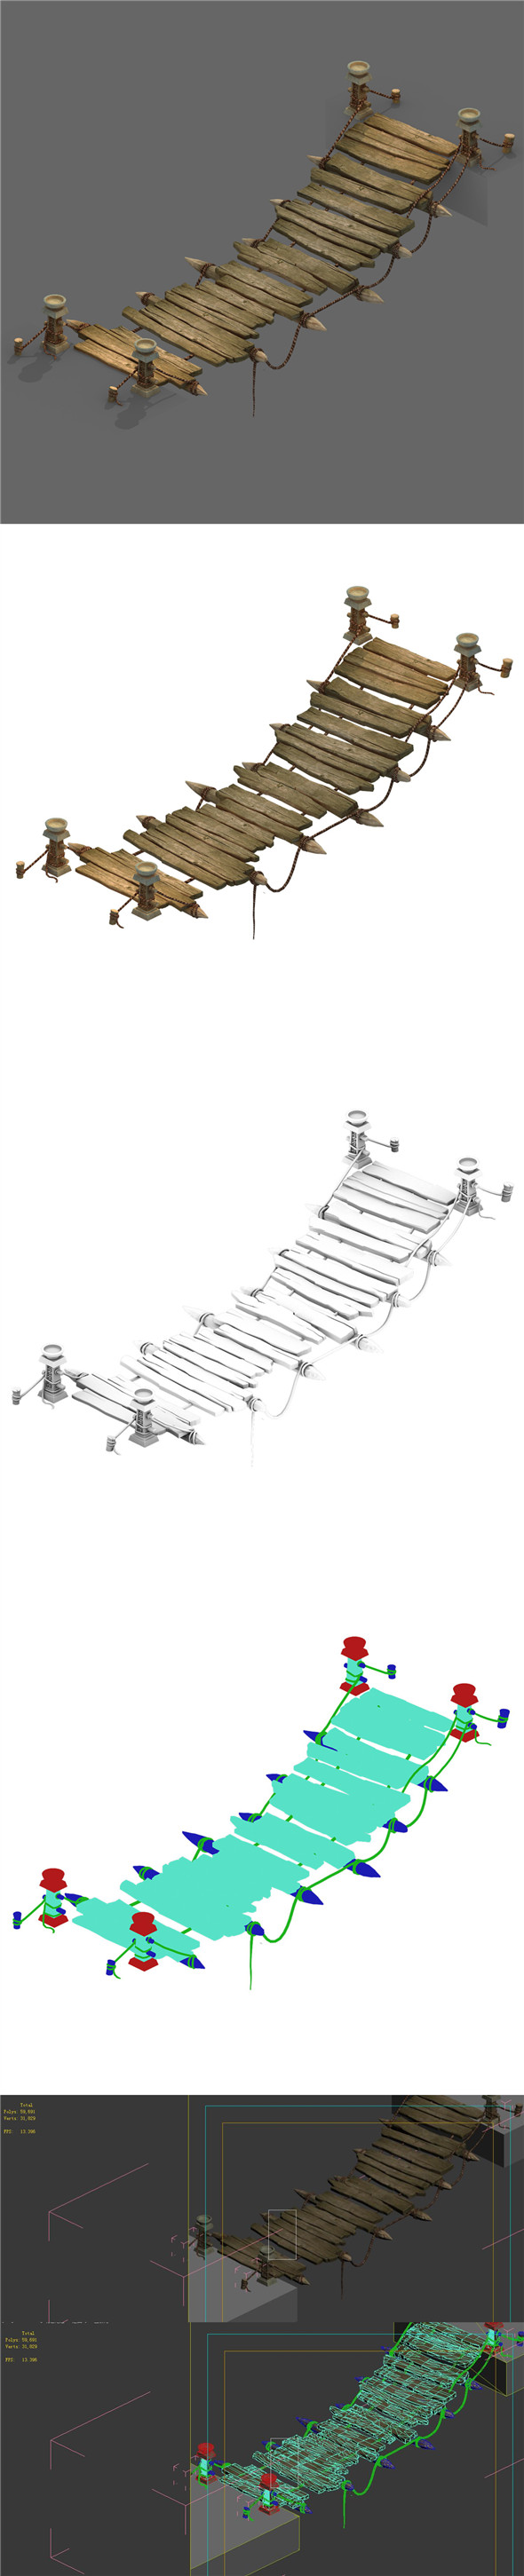 Field - Cable Suspension Bridge 01 - 3DOcean Item for Sale